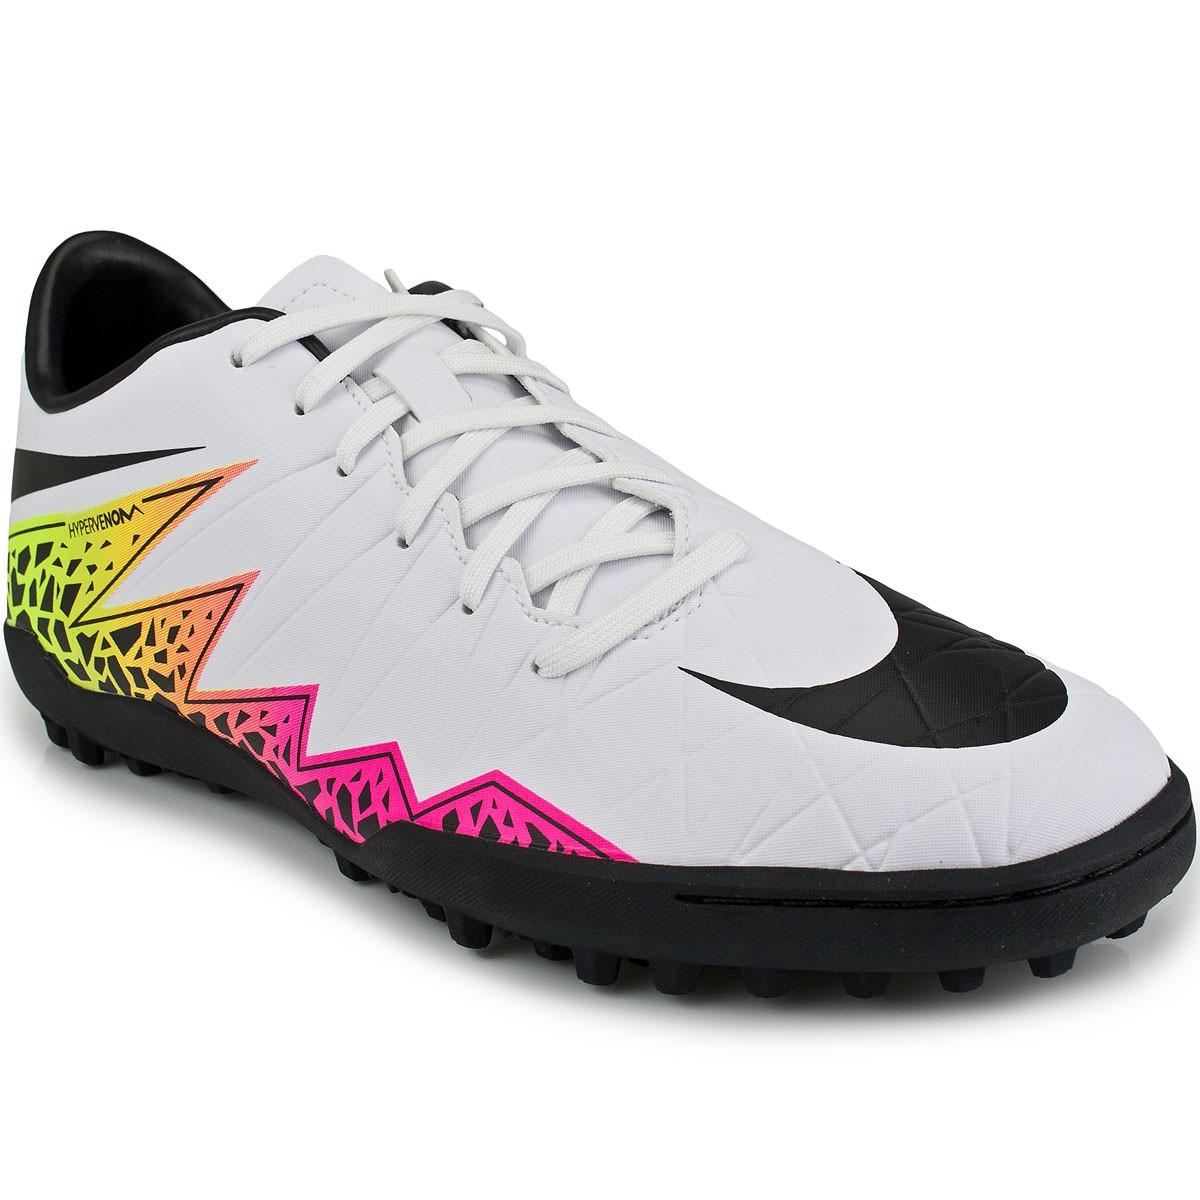 bf5342d3e85d5 Chuteira Nike Hypervenom Phelon II TF 749899